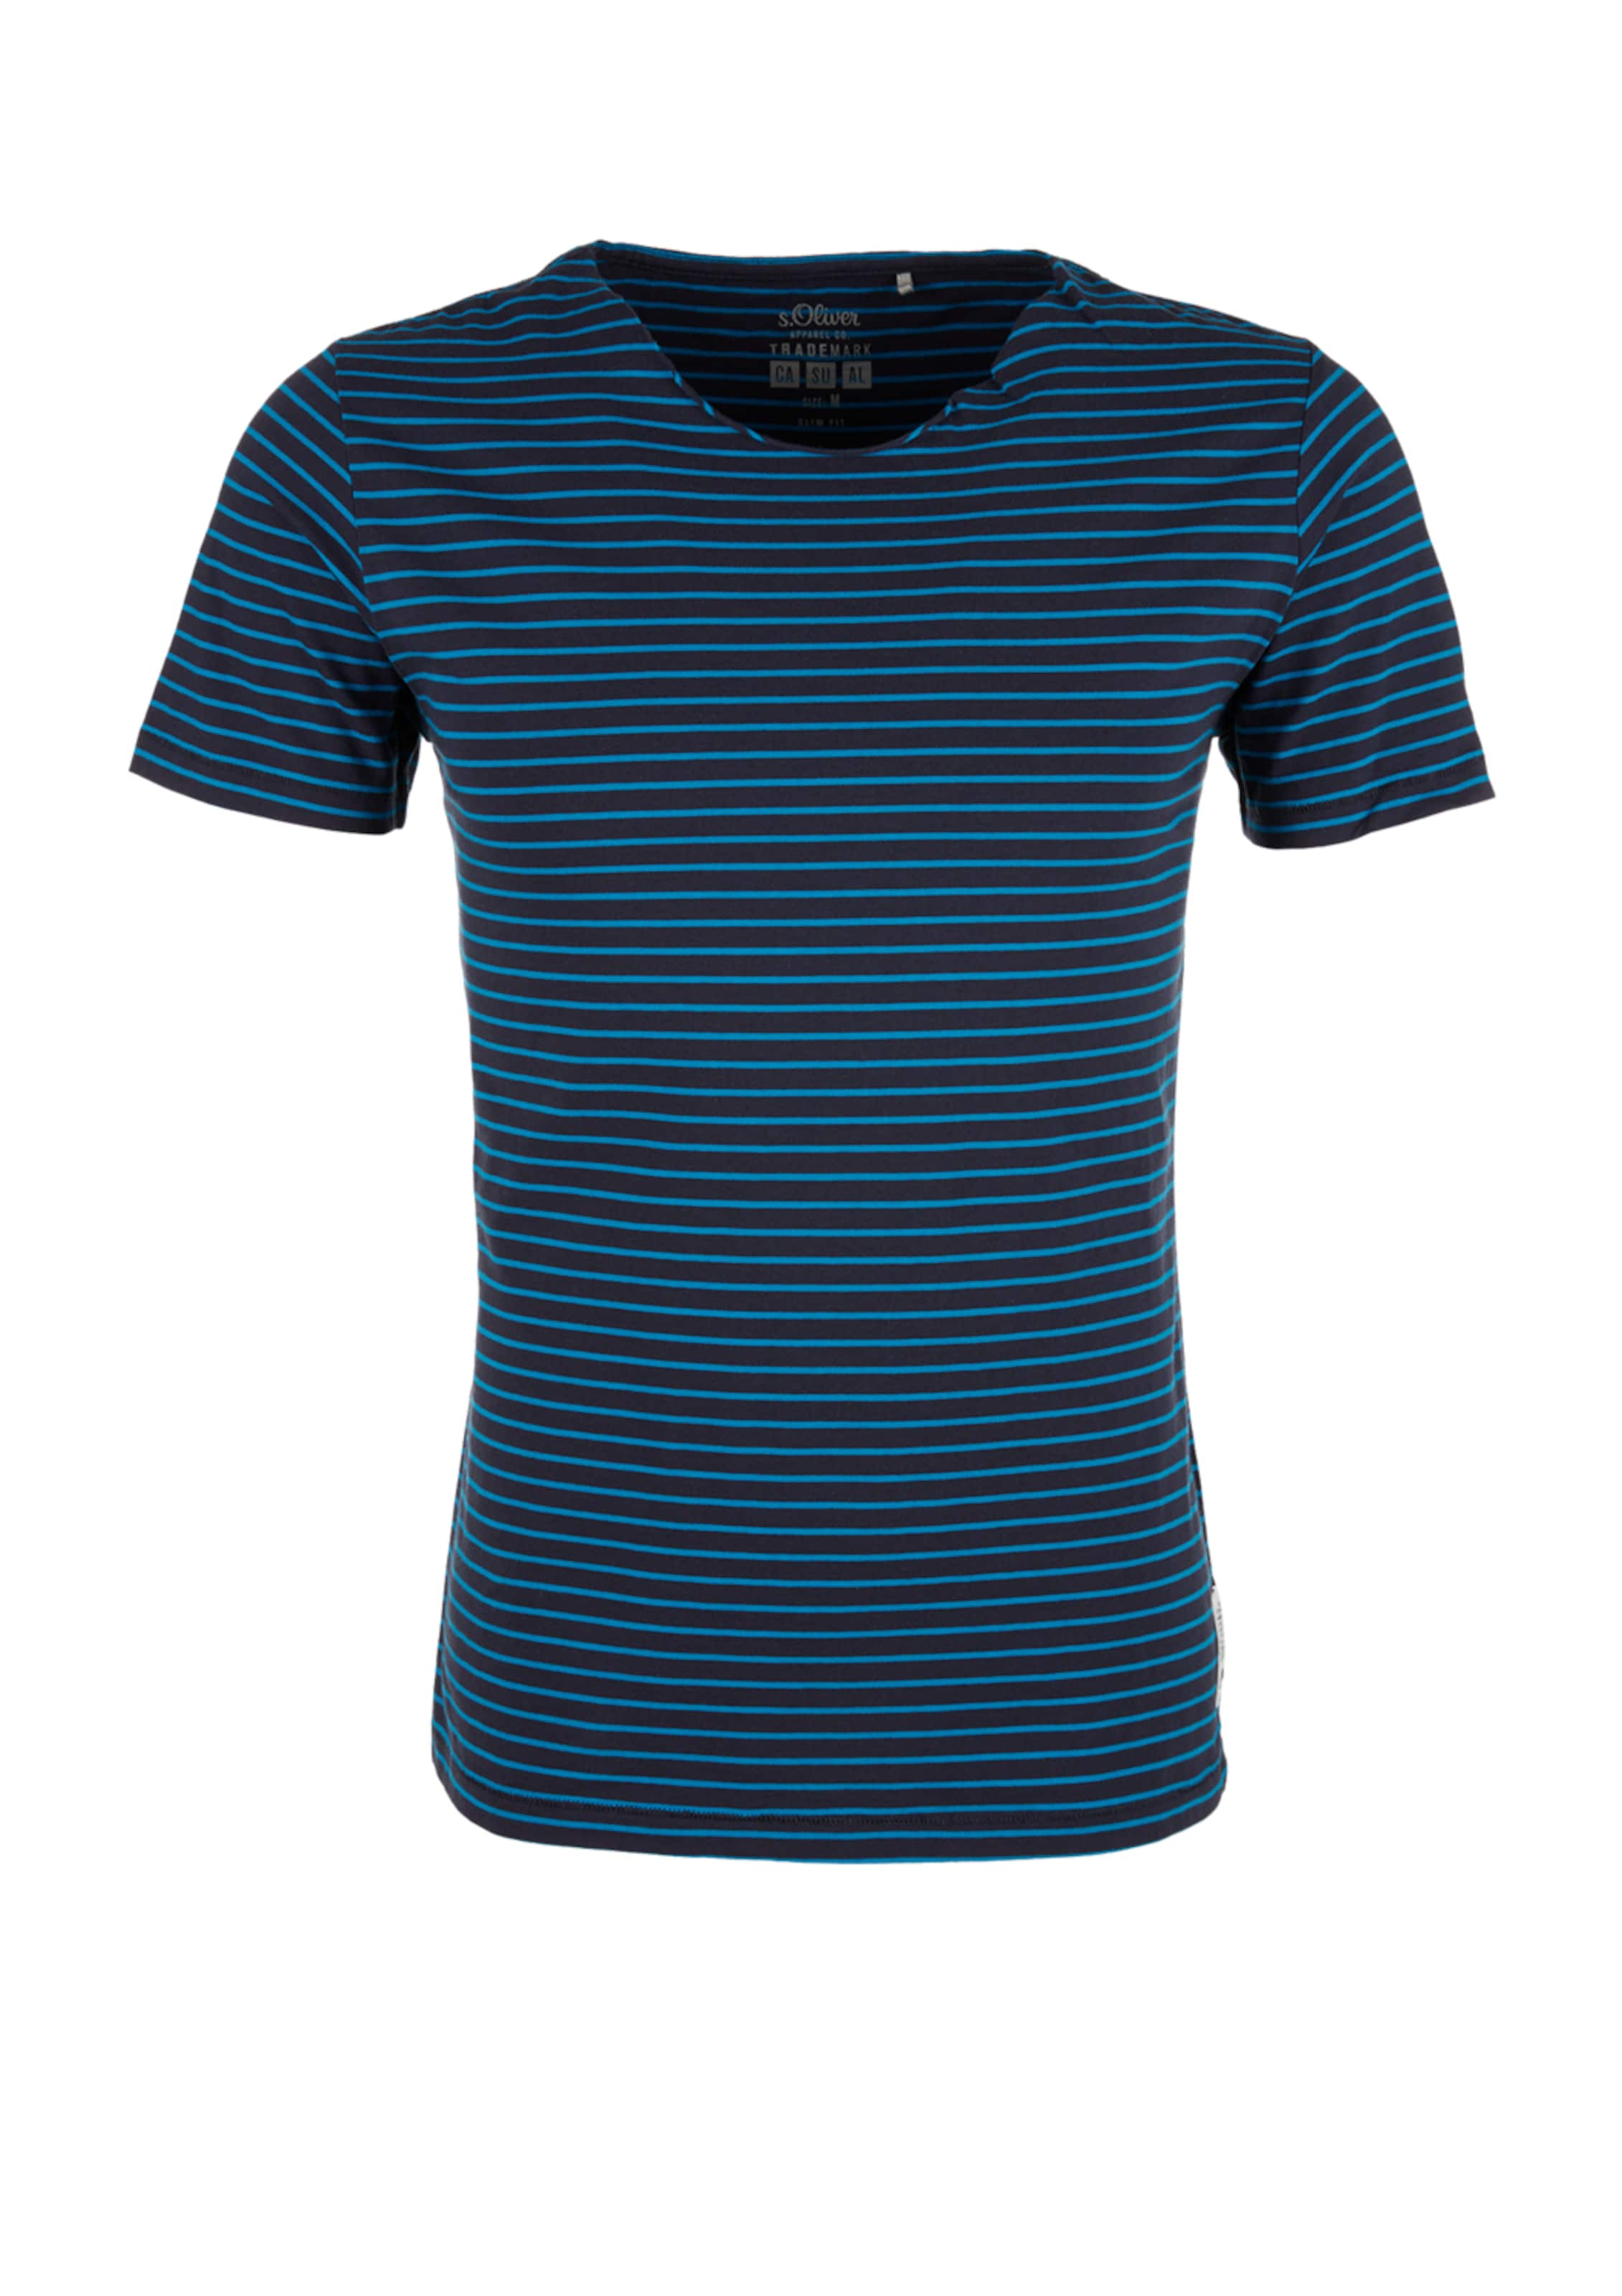 Red S Label Jerseyshirt TürkisNachtblau oliver In uTF1cKl3J